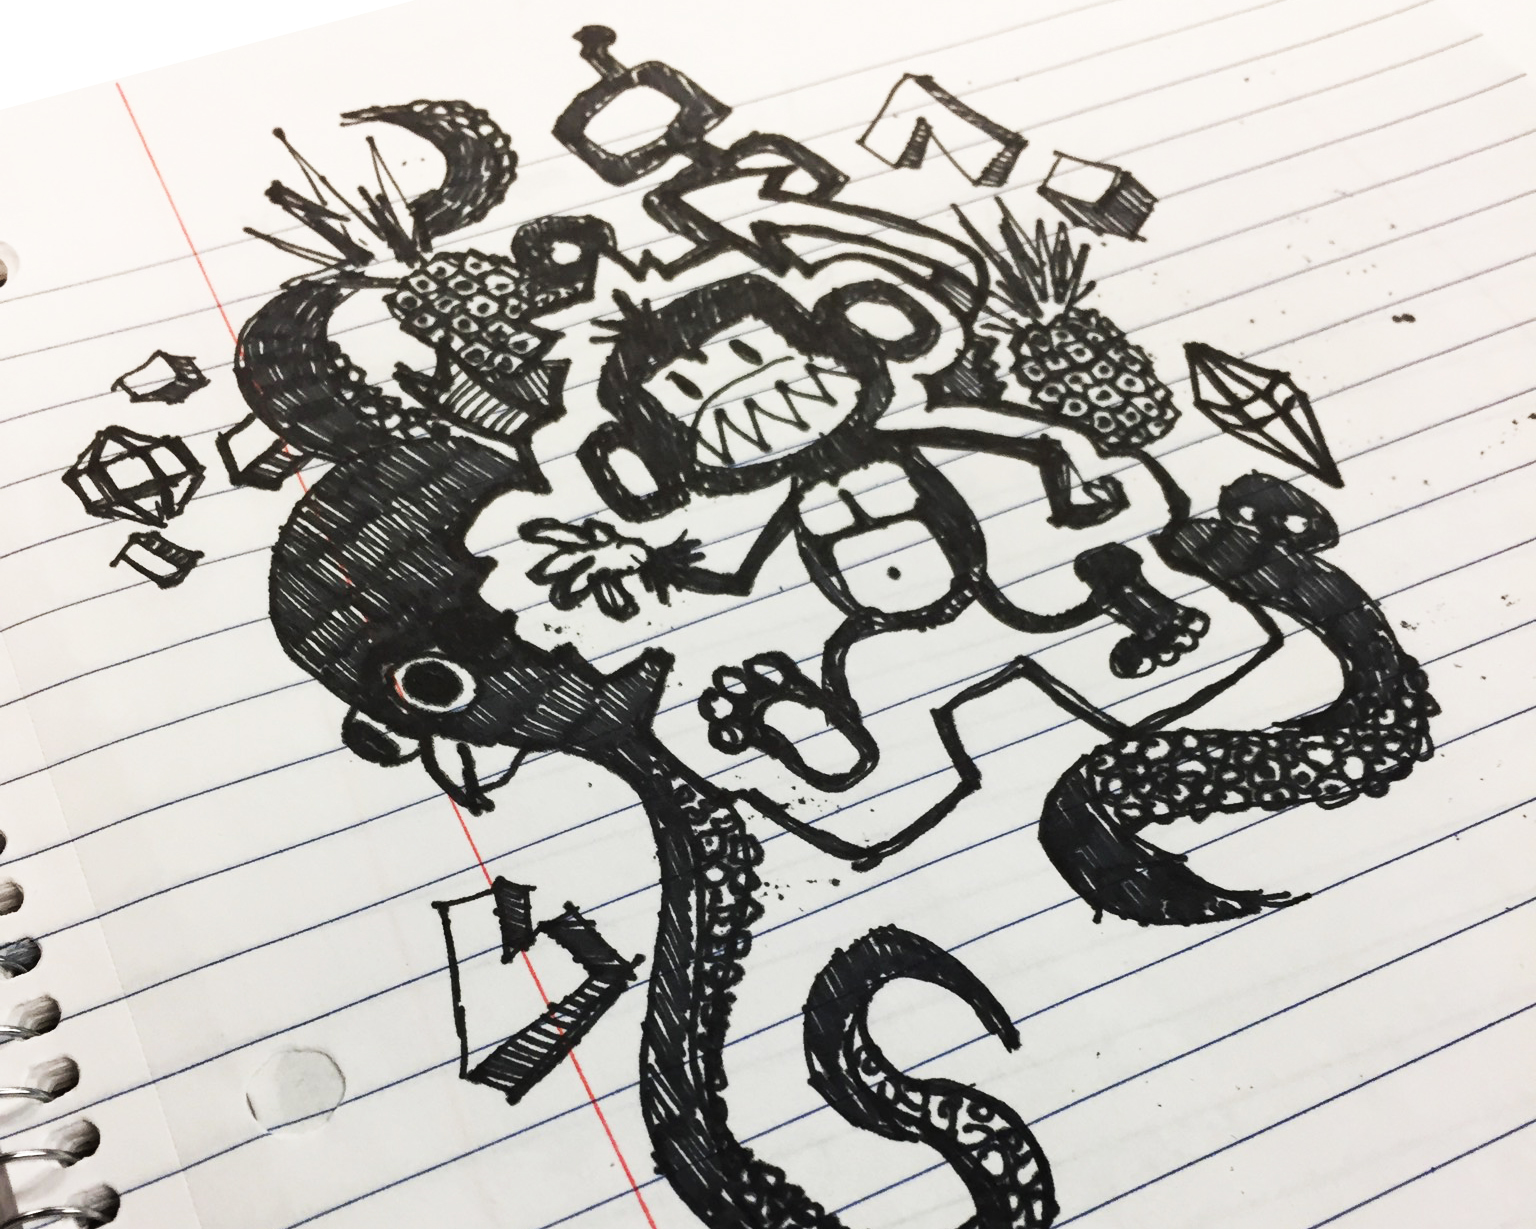 Scotts_Sketch.jpg